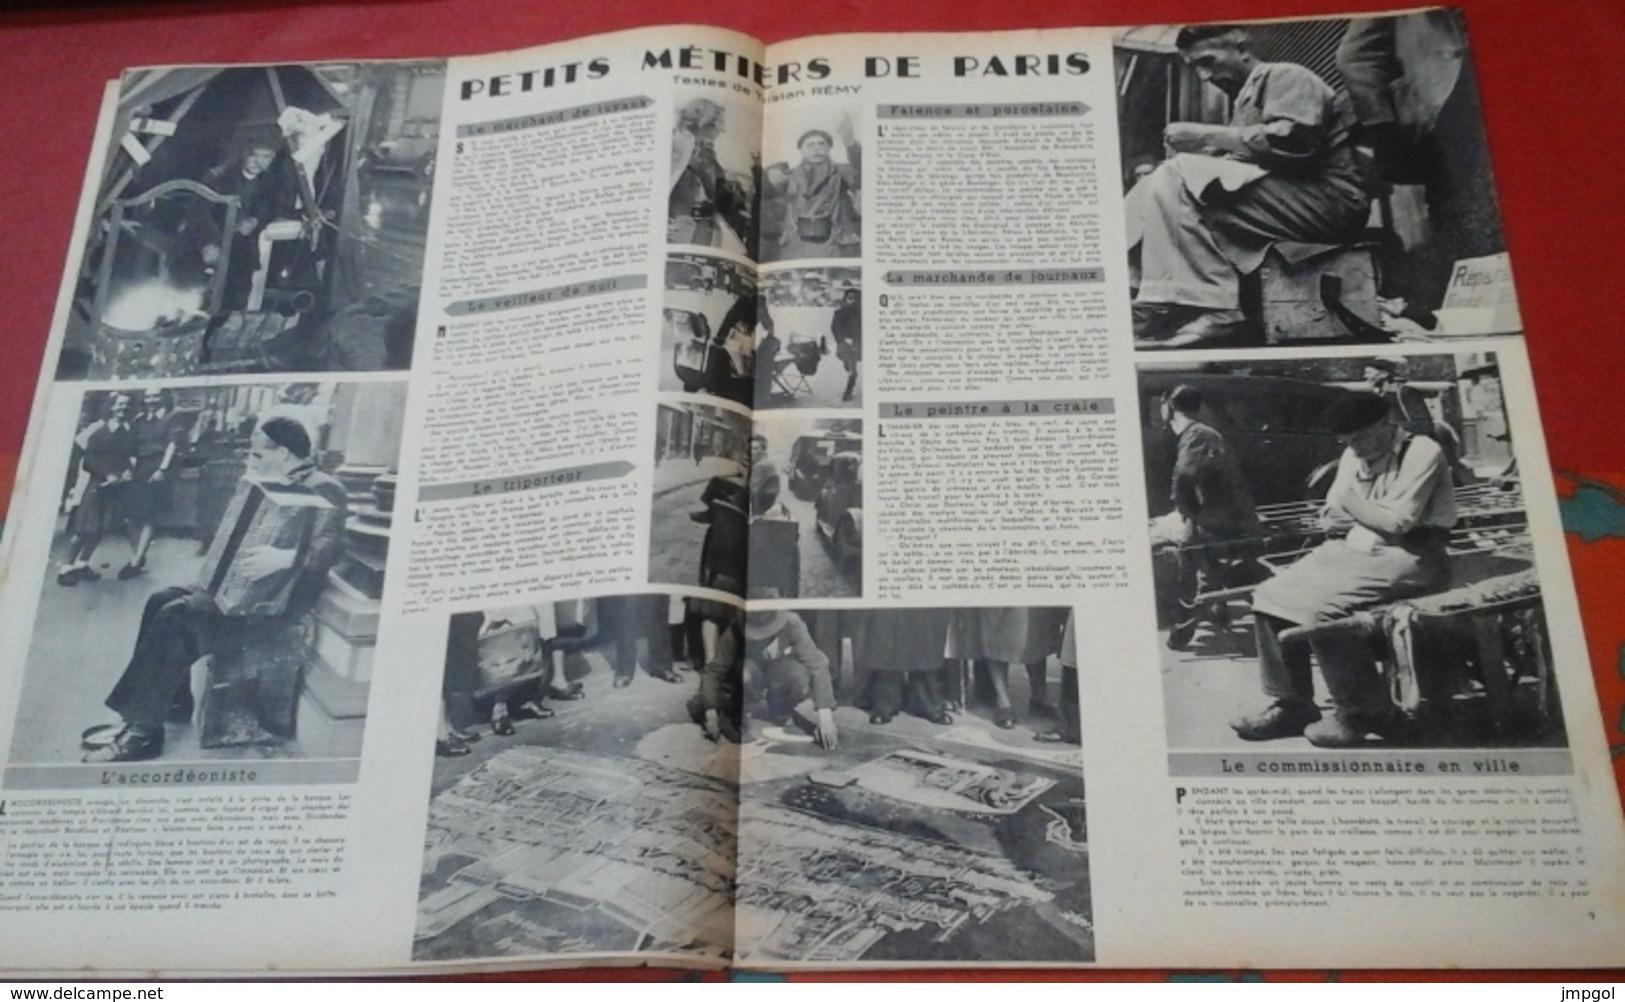 Regards N°153 9 Juillet 1948 La Turquie Dans La Nuit Féodale, Petits Métiers De Paris,Edward G. ROBINSON - Bücher, Zeitschriften, Comics